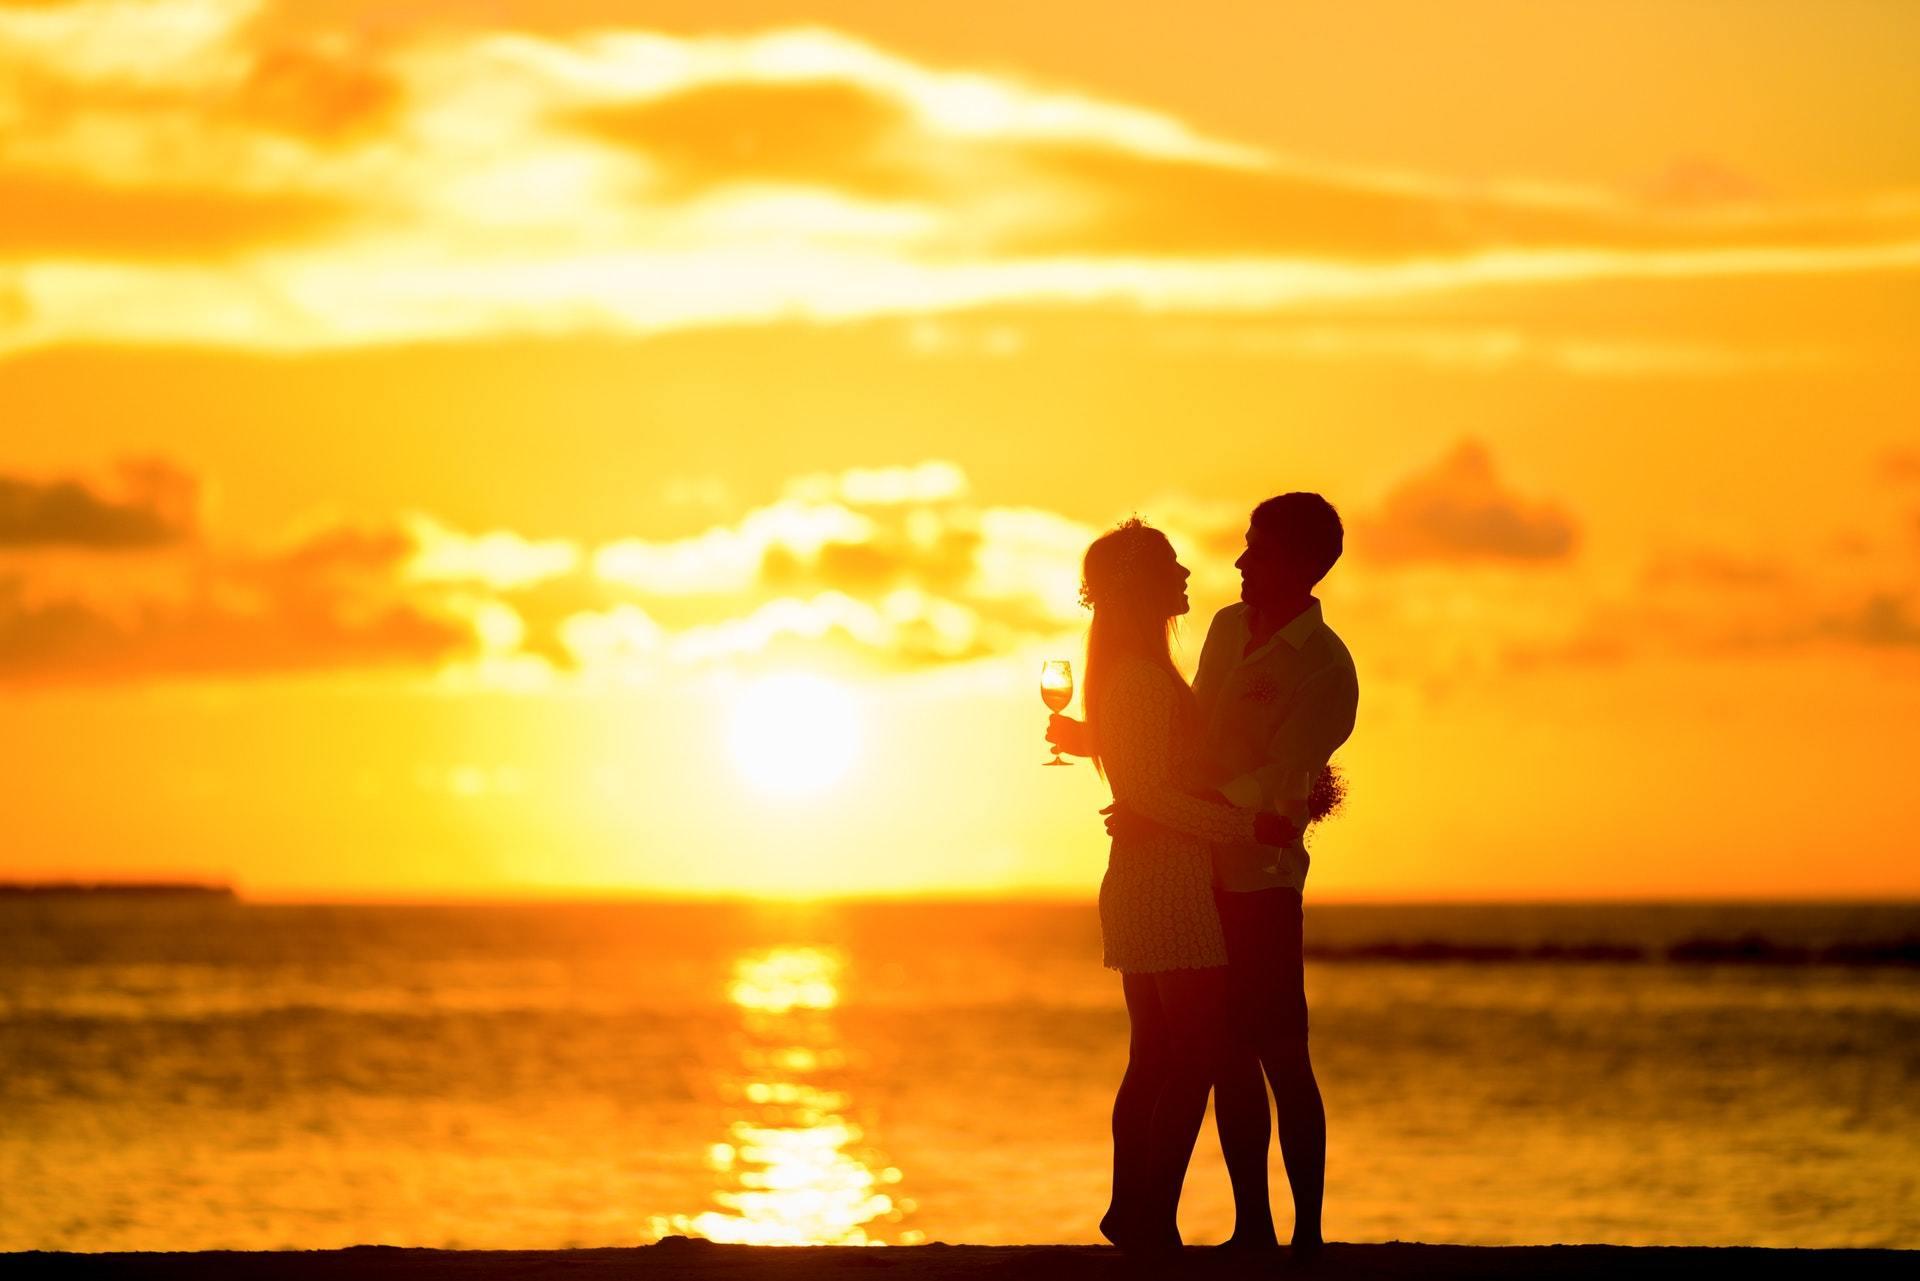 gratis Christelijke dating in Duitsland Dr nerdlove online dating 101